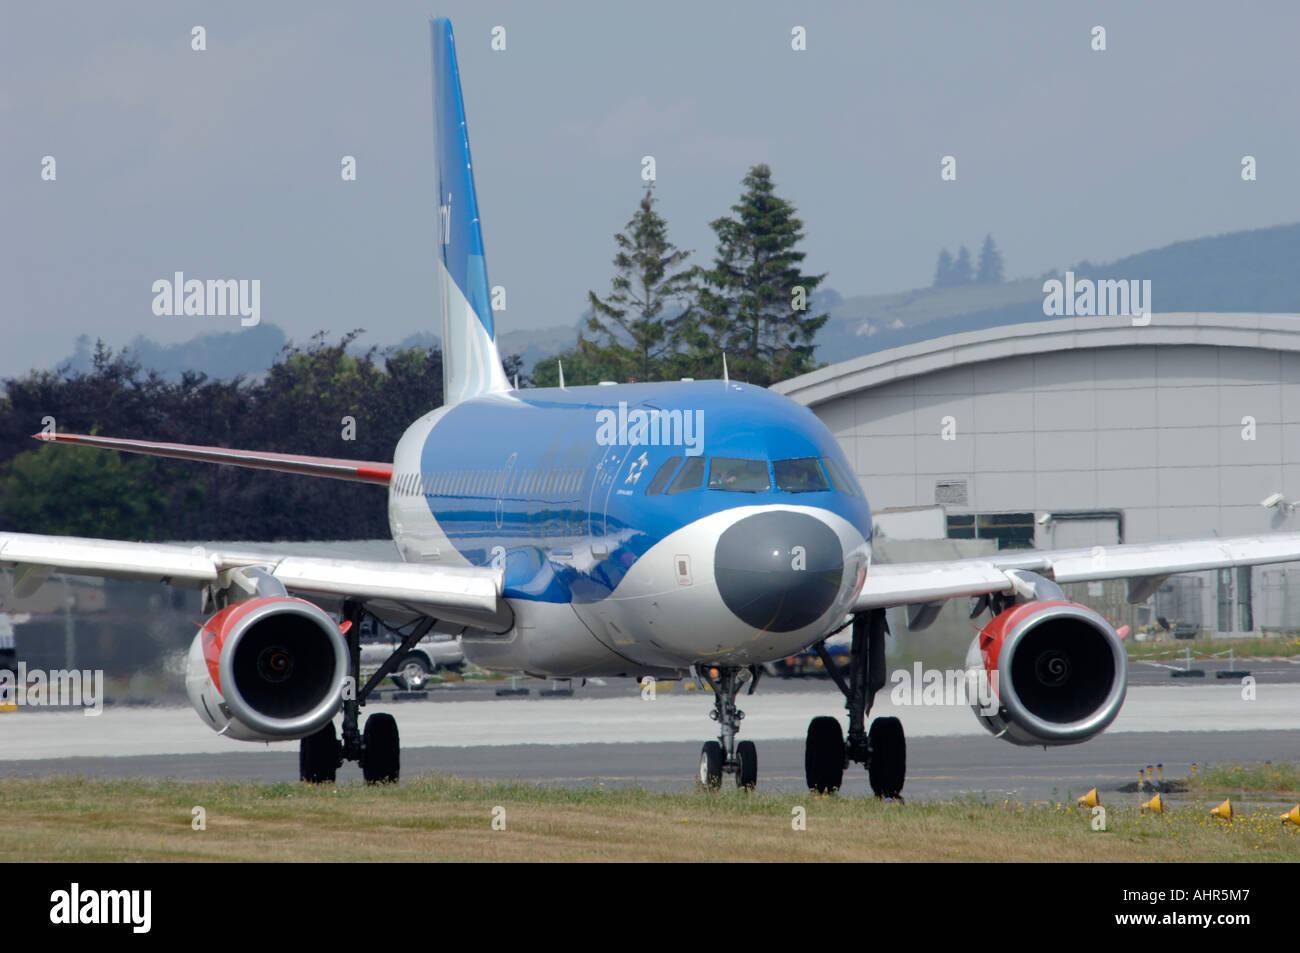 British Midland Boeing Airbus 319 Civil Passenger Airliner.  G-DBCD Inverness  Airport - Stock Image